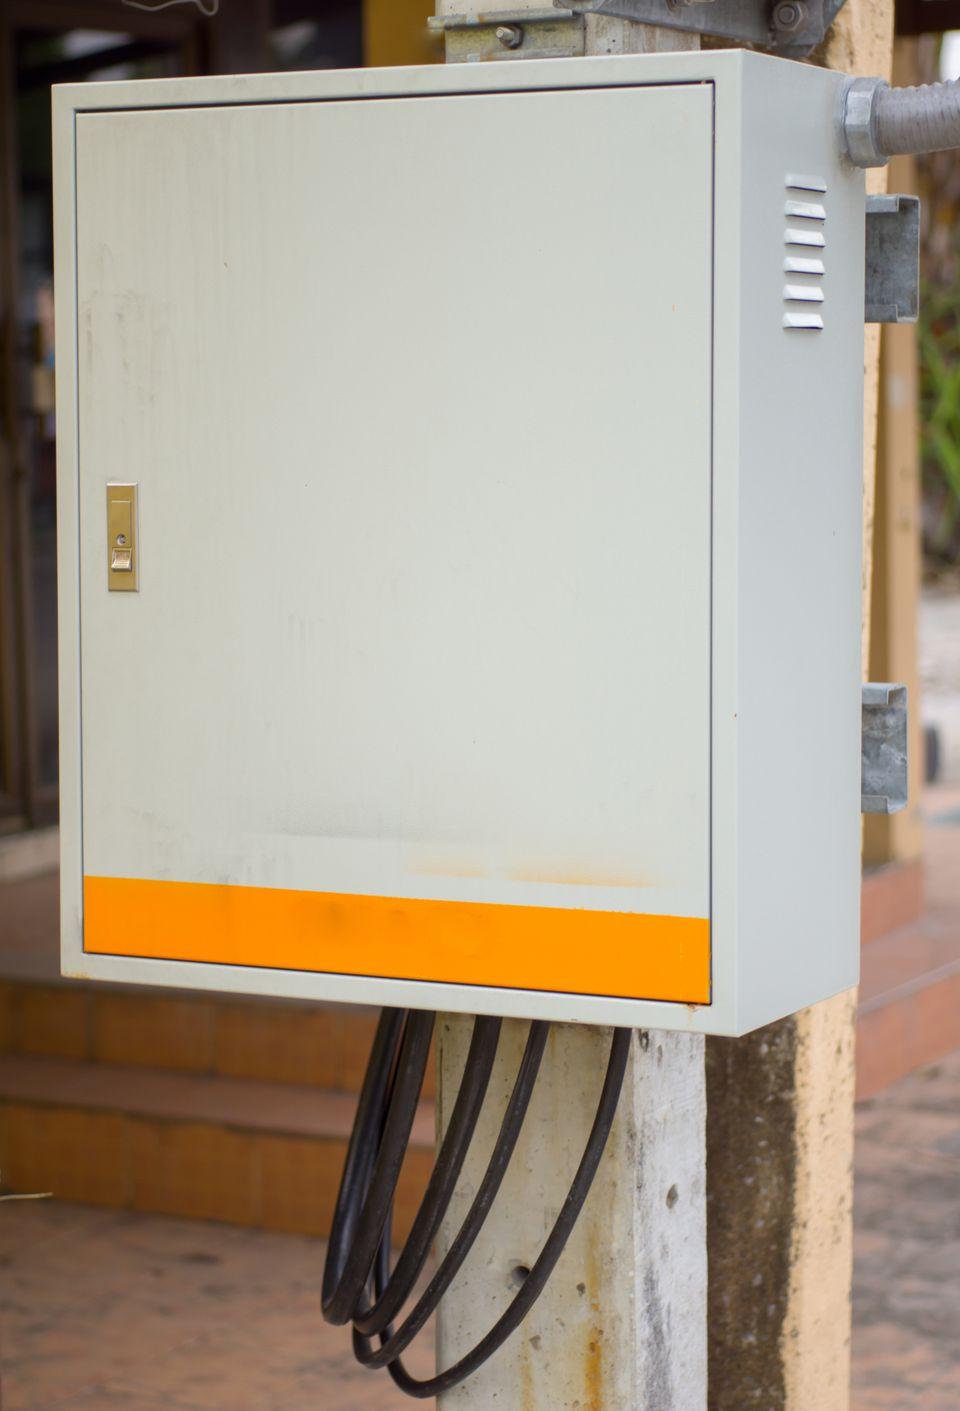 Weatherproof Electrical Box